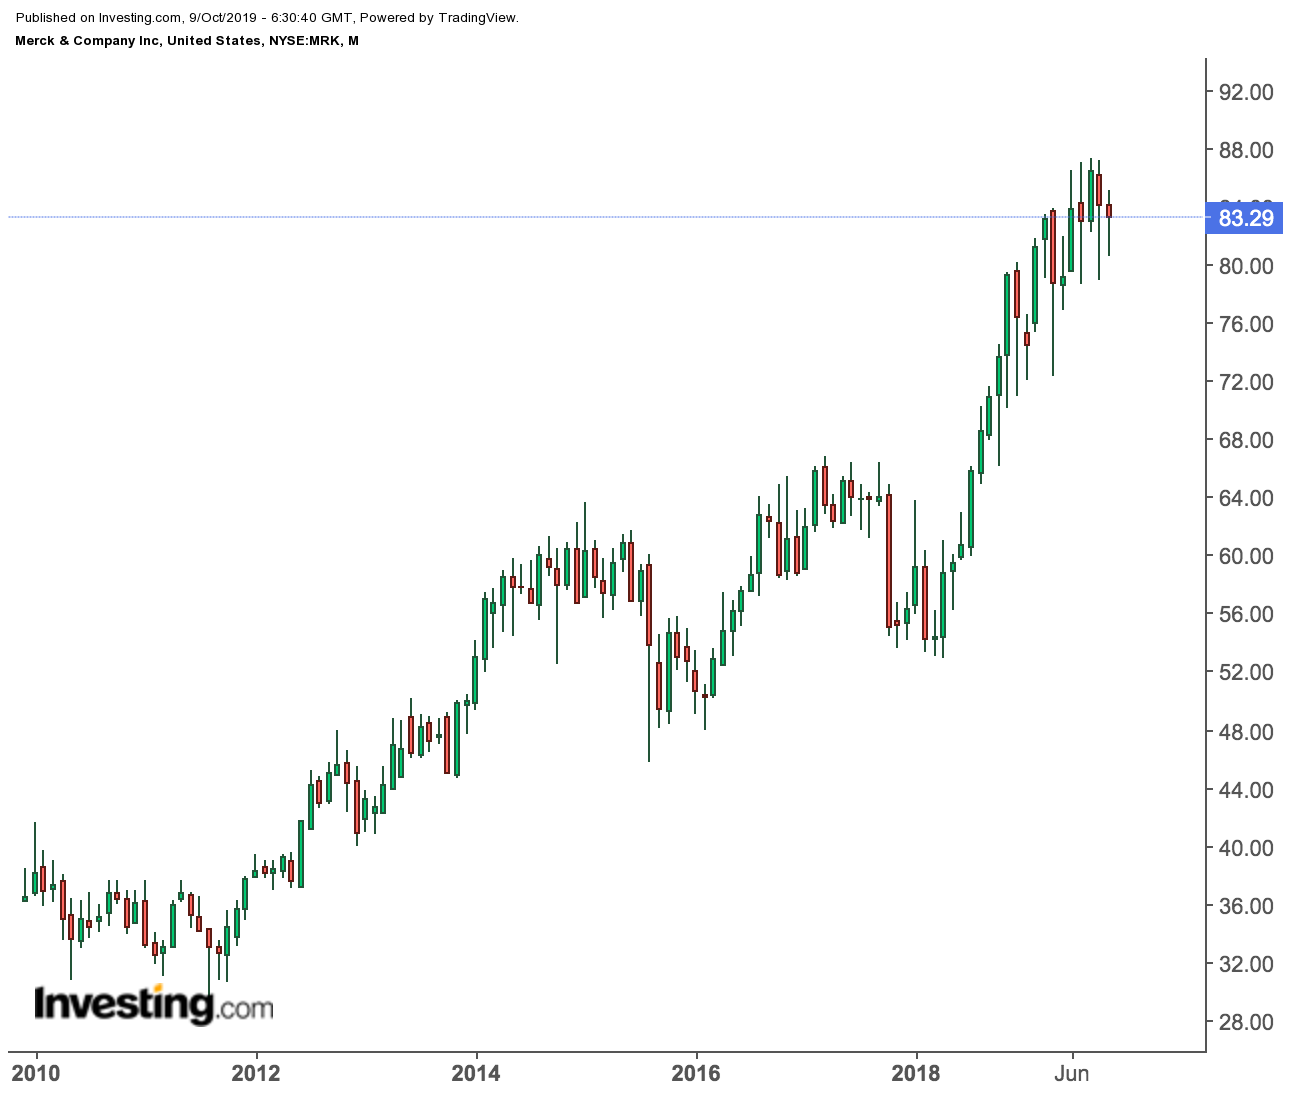 Merck & Co. price chart